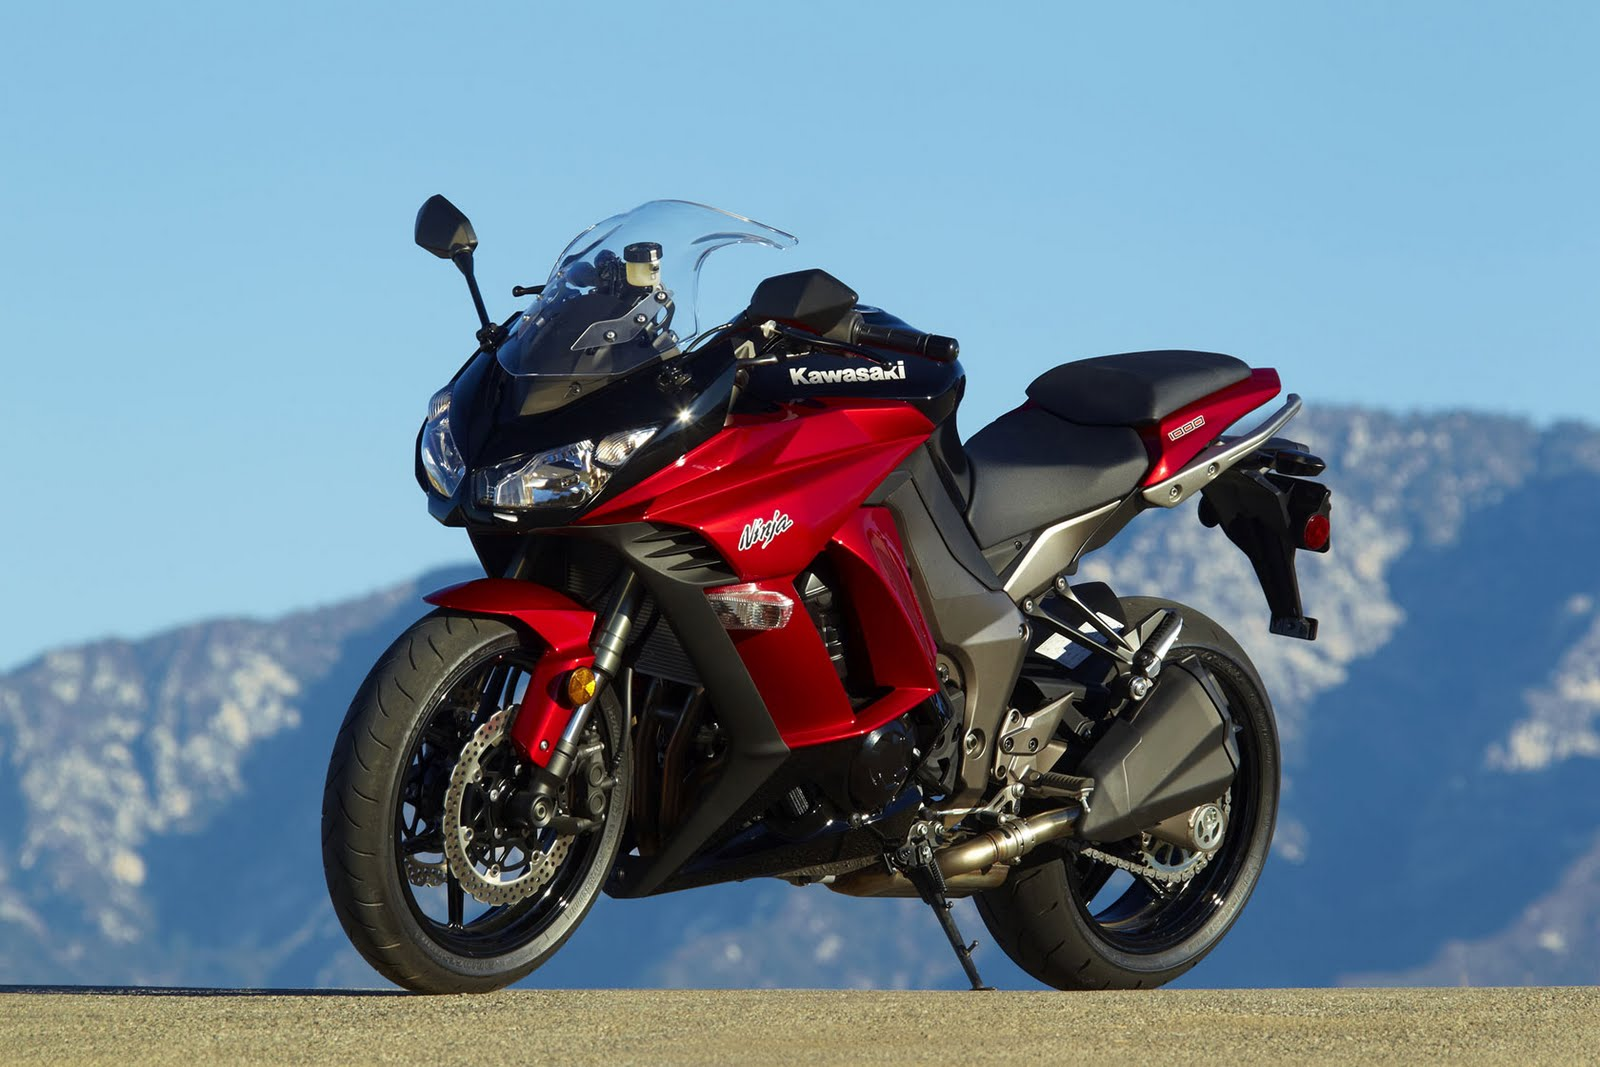 2011 kawasaki ninja 1000 motorcycle